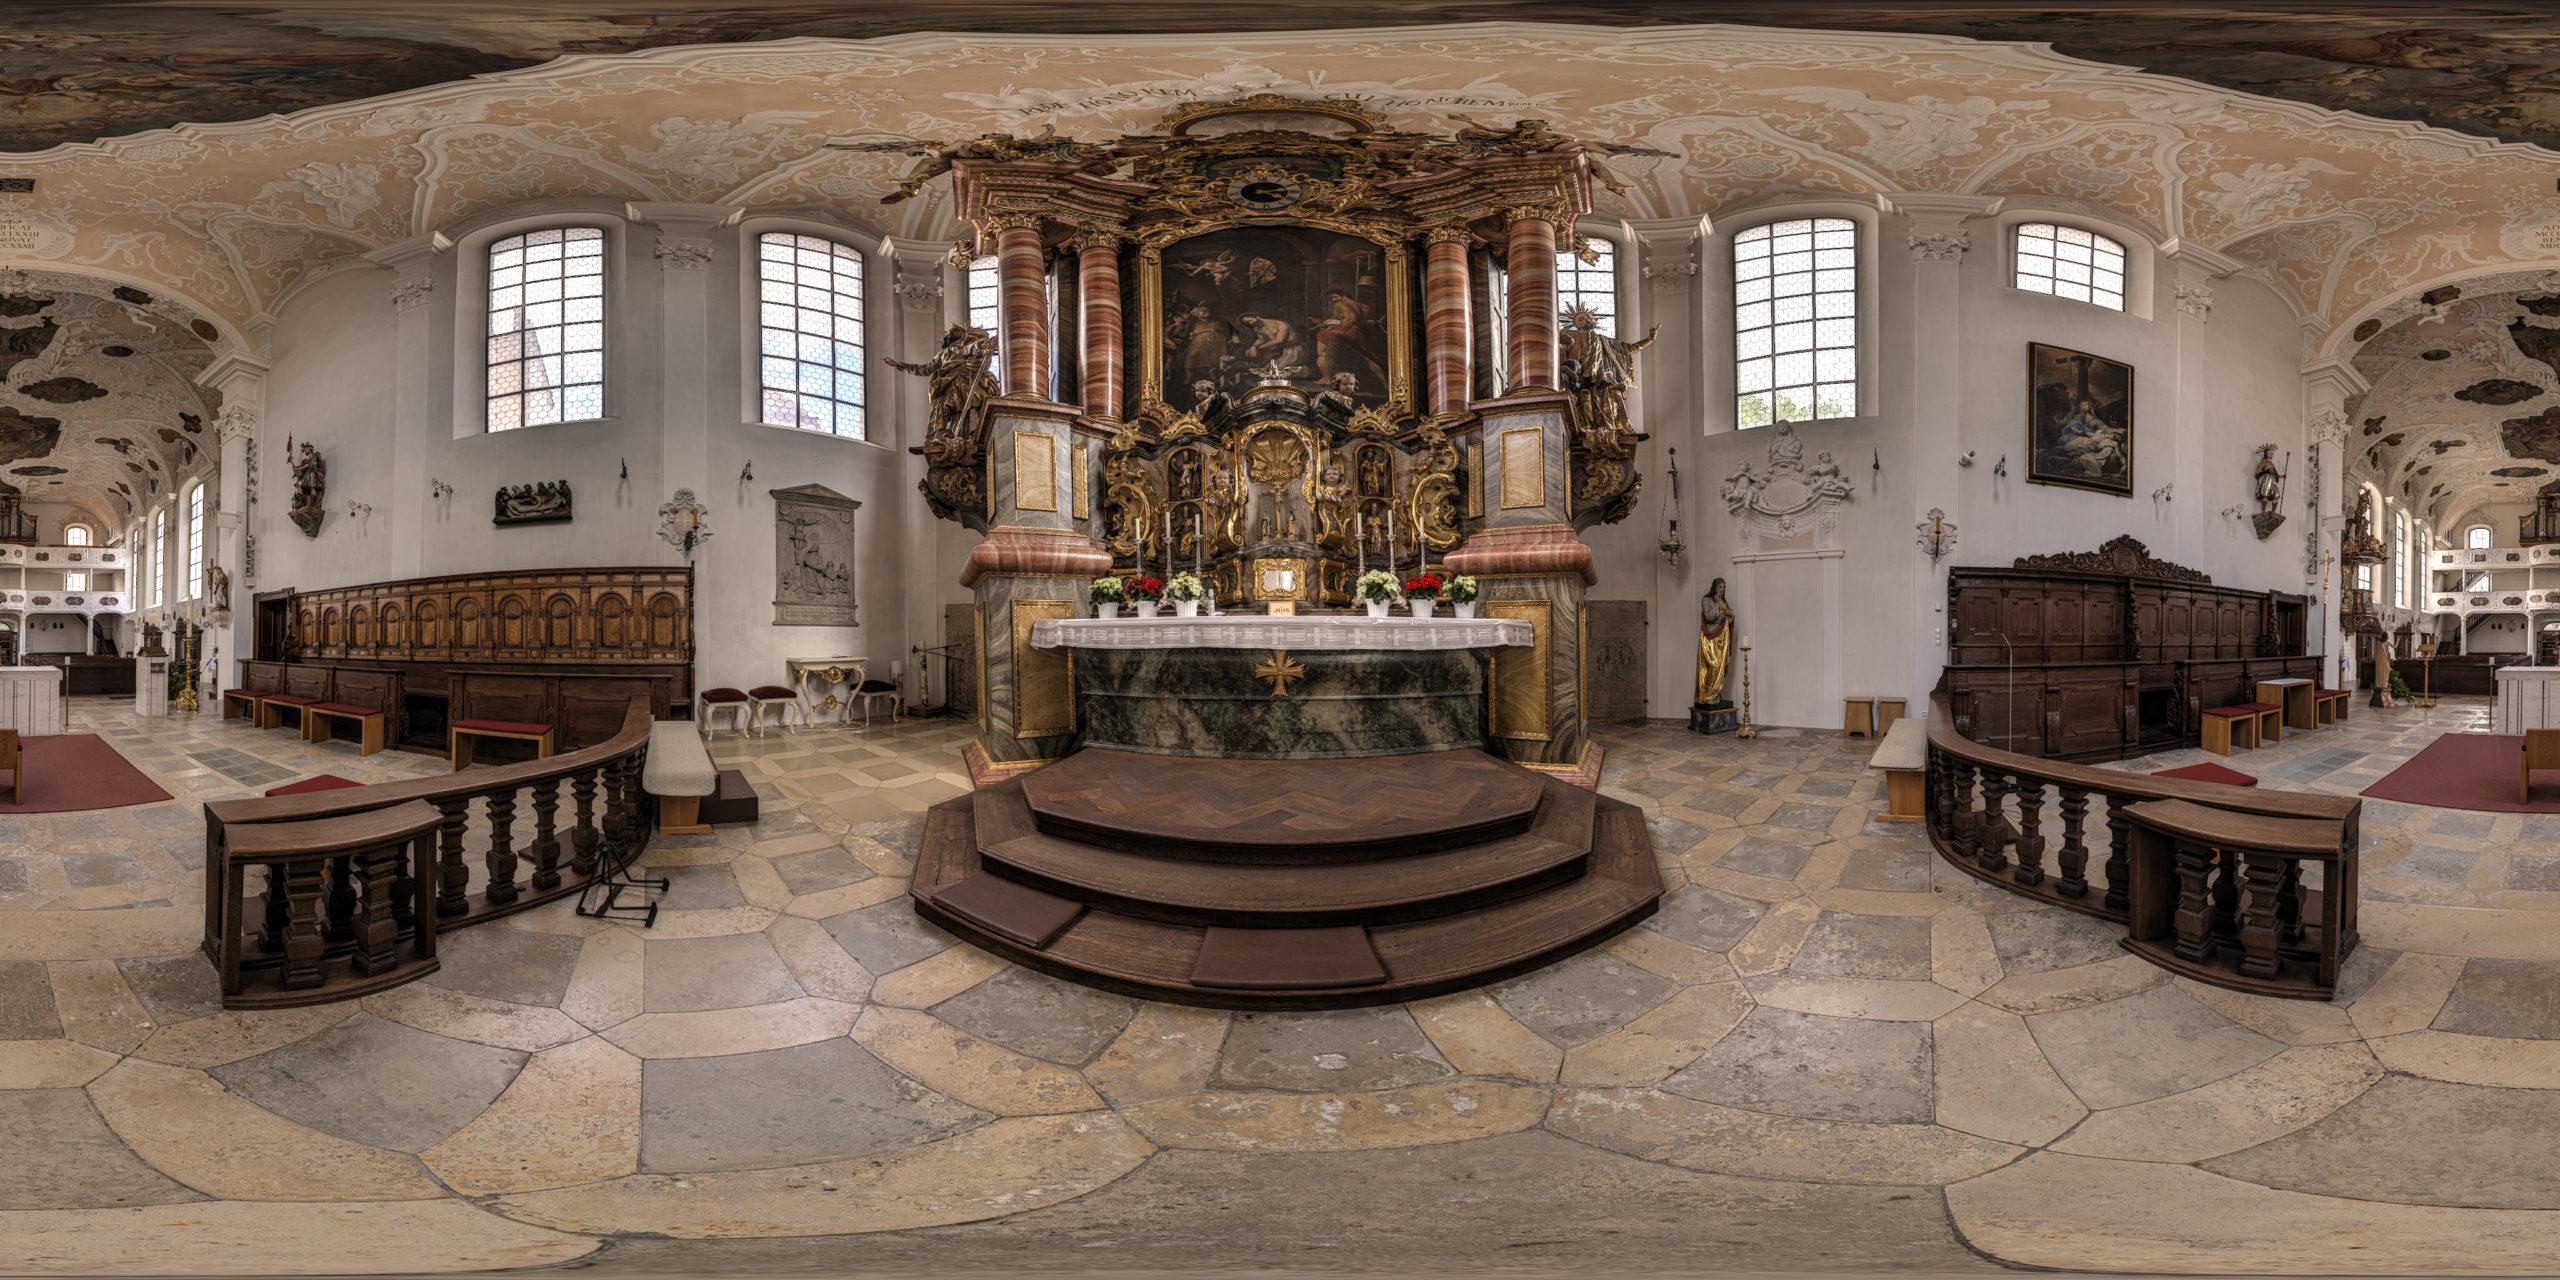 HDRI-Skies-Saint-Johannes-Hilpoltstein